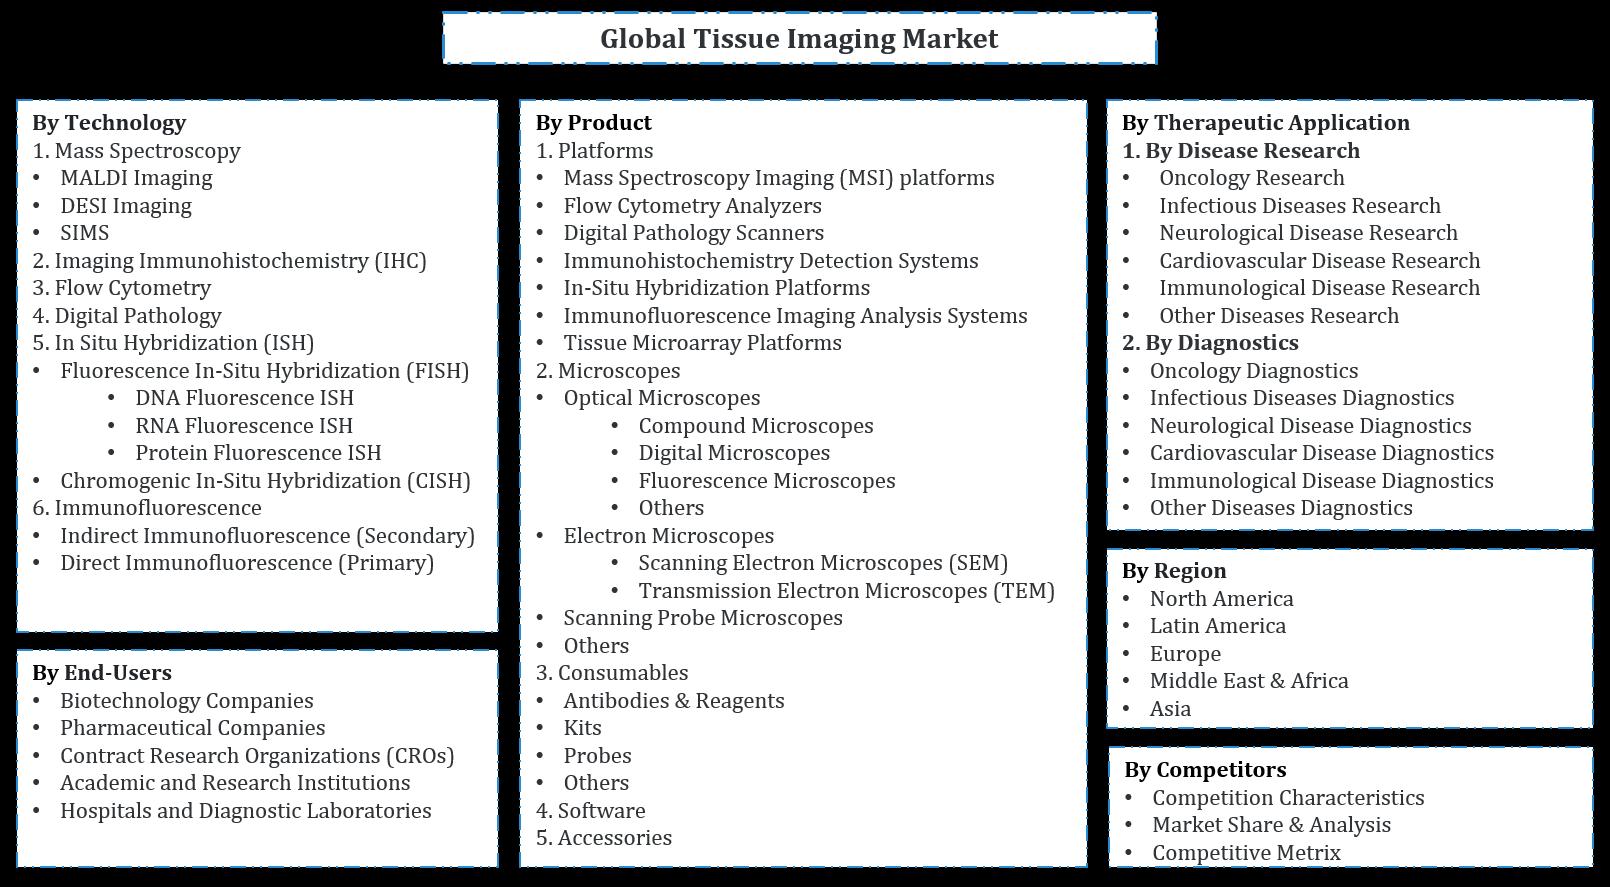 Global Tissue Imaging Market Segmentation